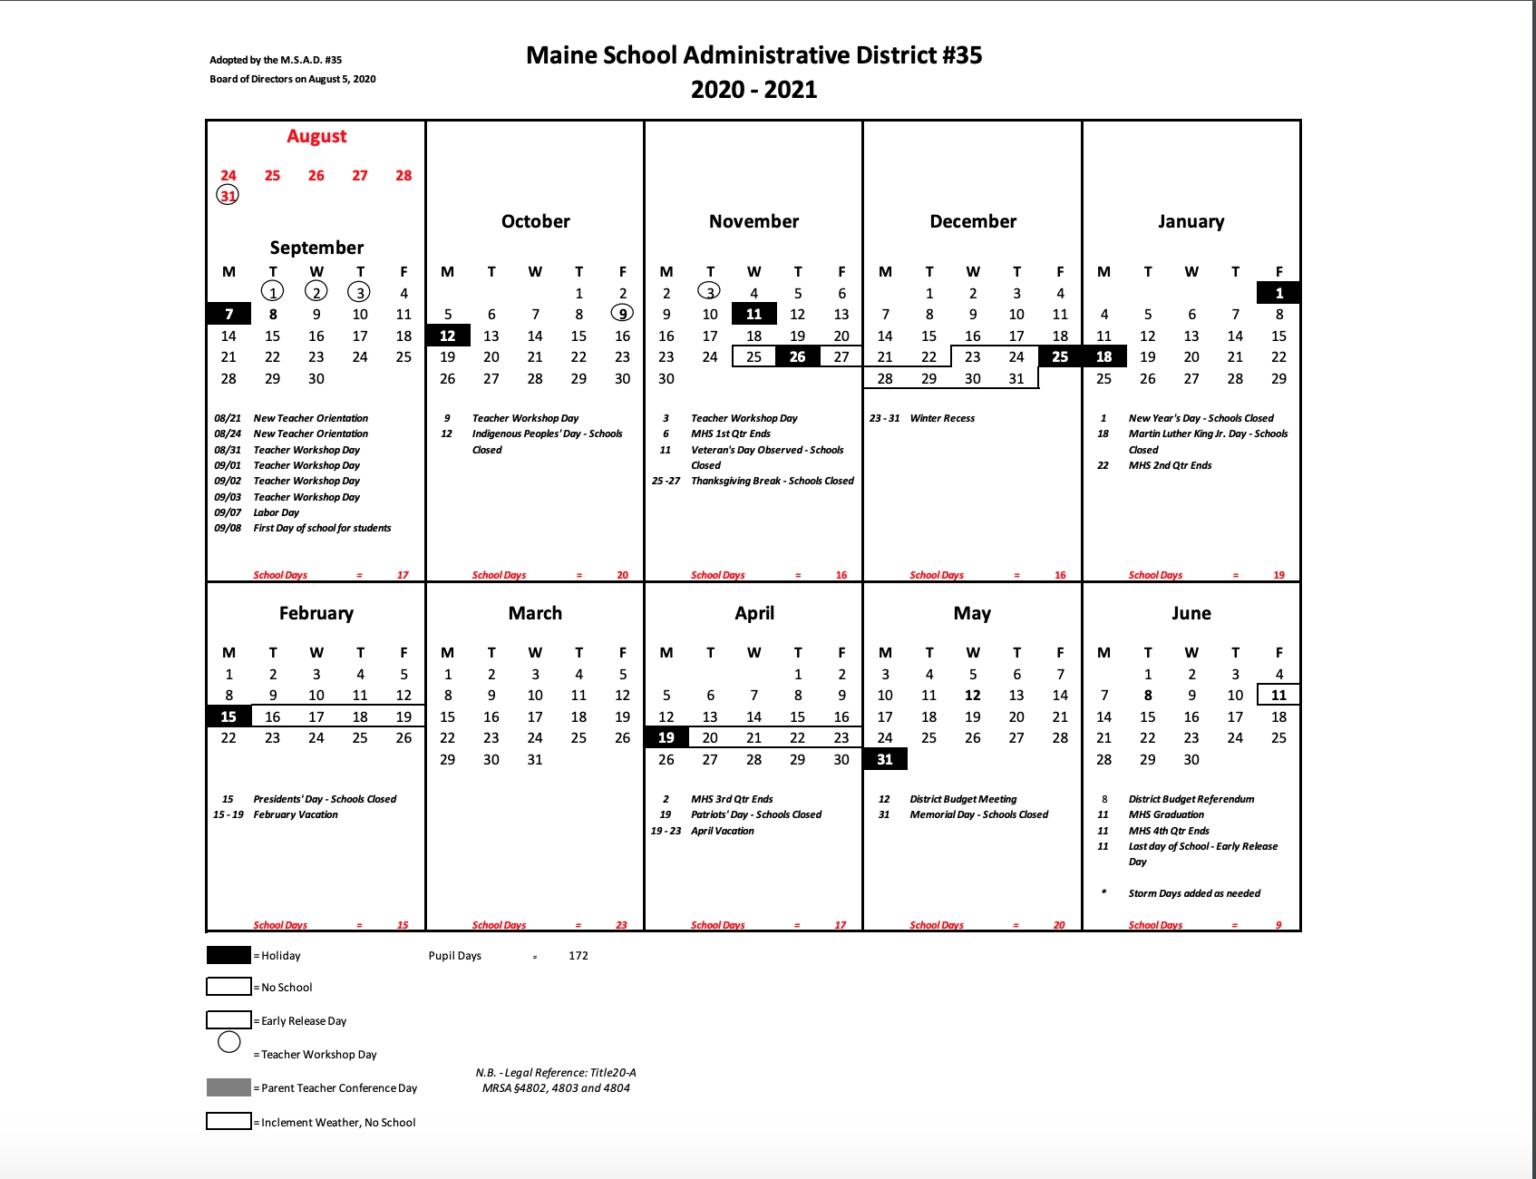 Calendar For 2020-2021 (Aug 5) - Rsu #35 Within Depo Provera Schedule 2021 | Calendar Template